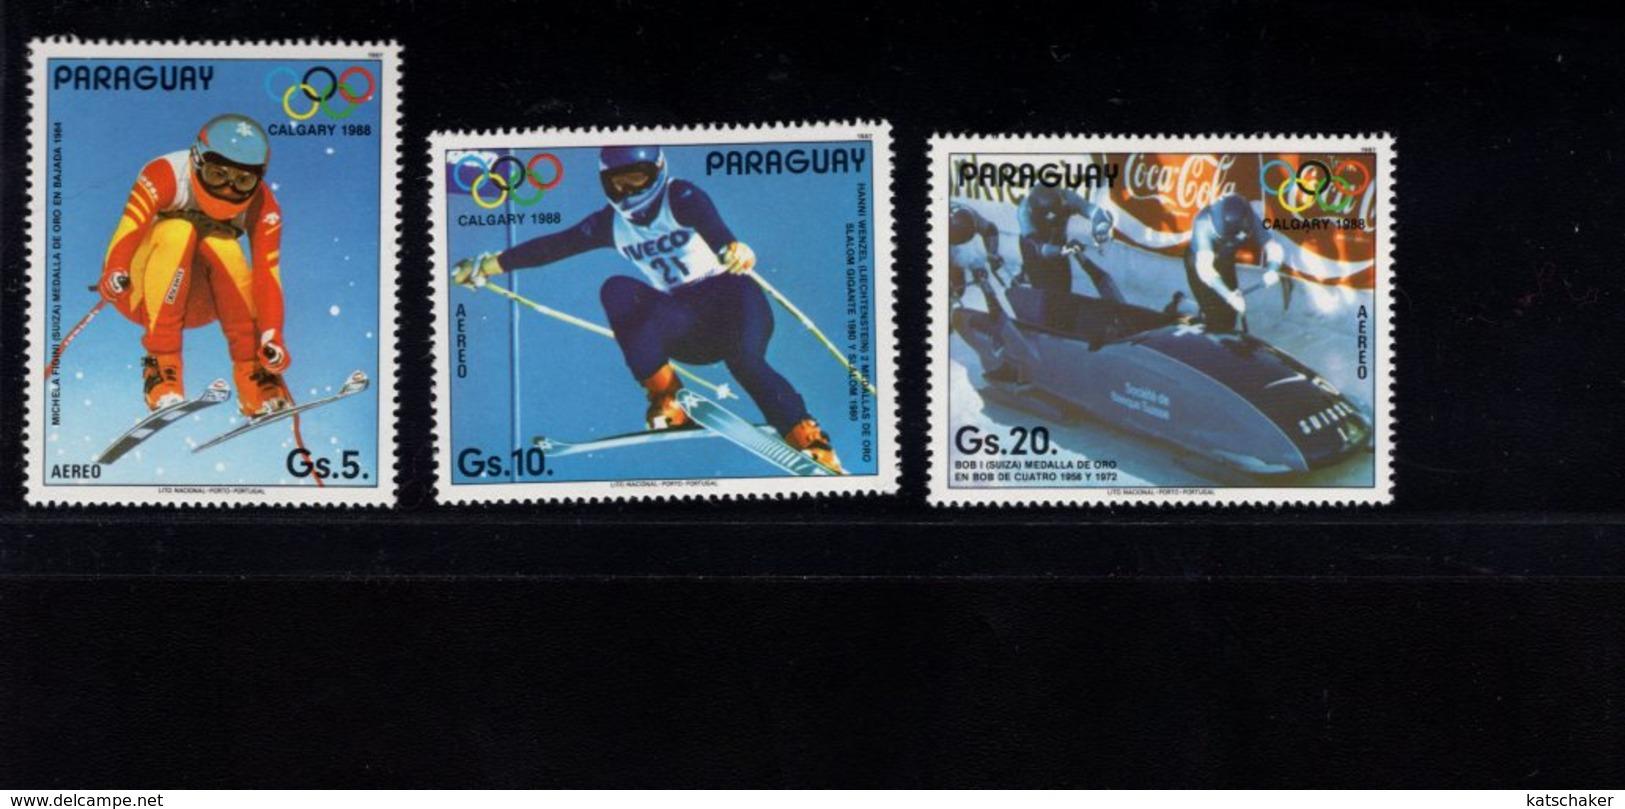 739754336  POSTFRIS MINT NEVER HINGED POSTFRISCH EINWANDFREI  SCOTT C679 680 681 1988 WINTER OLYMPICS CALGARY - Paraguay